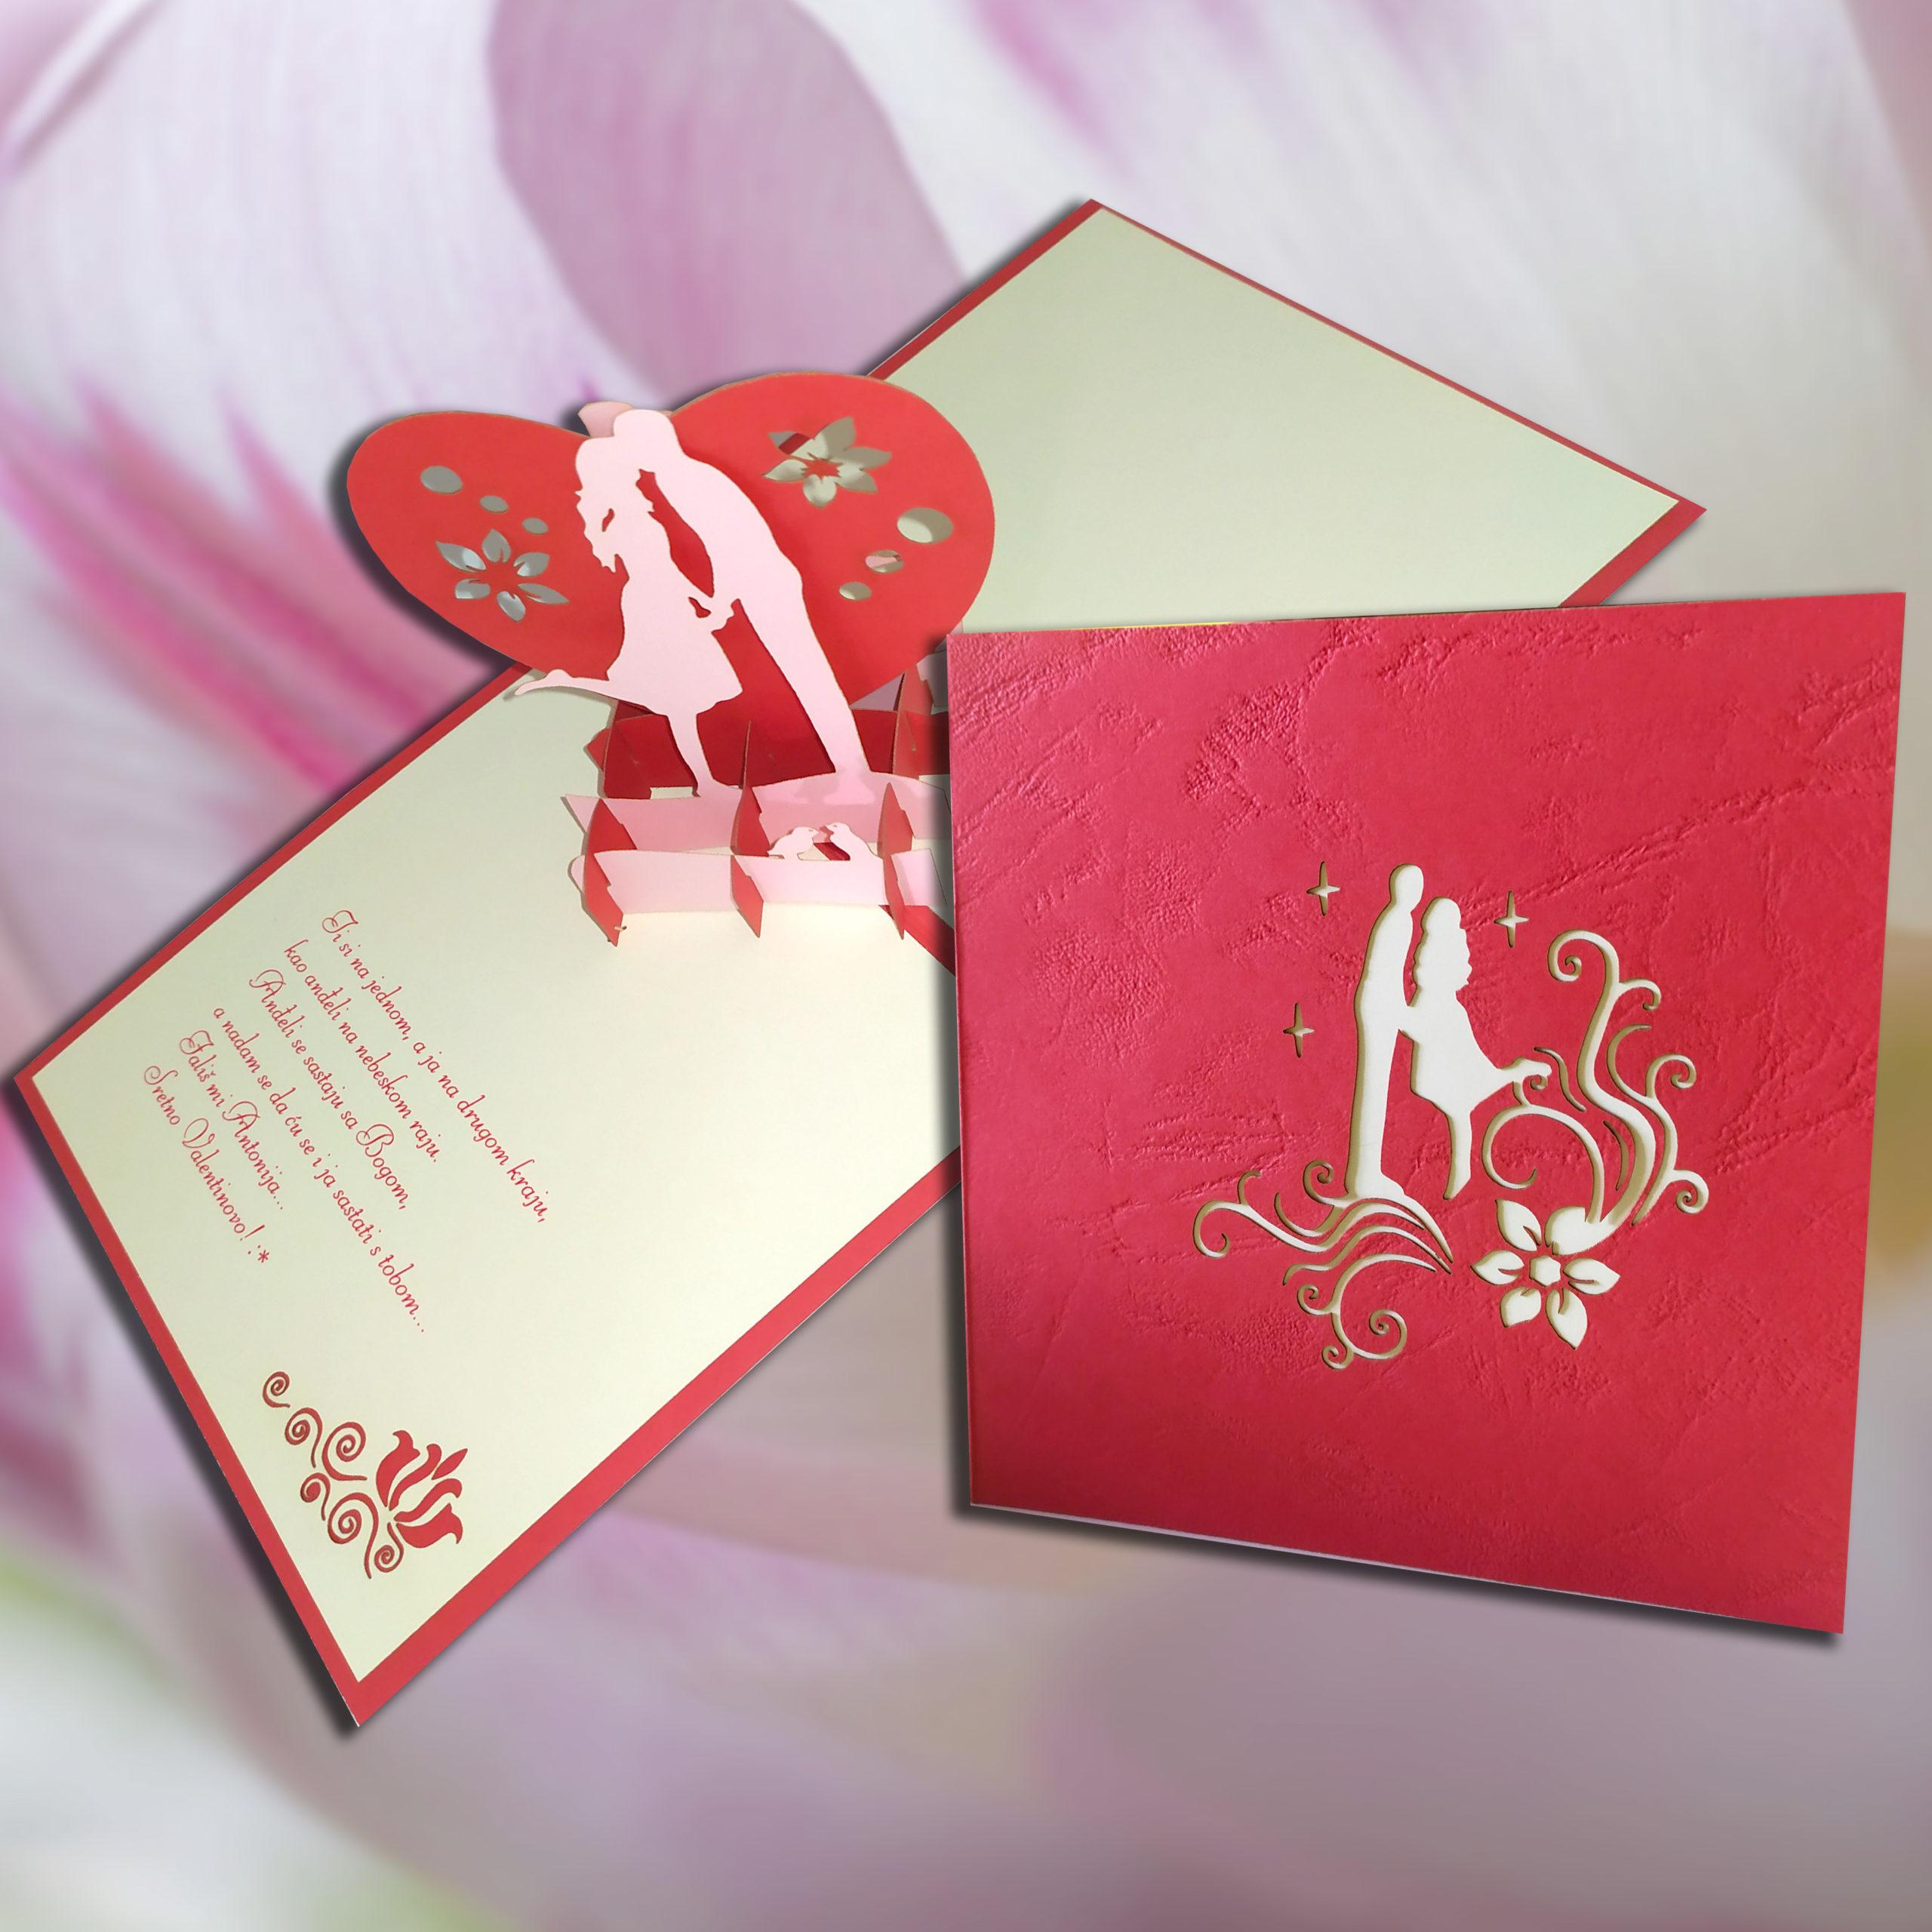 Personalizirana čestitka za Valentinovo